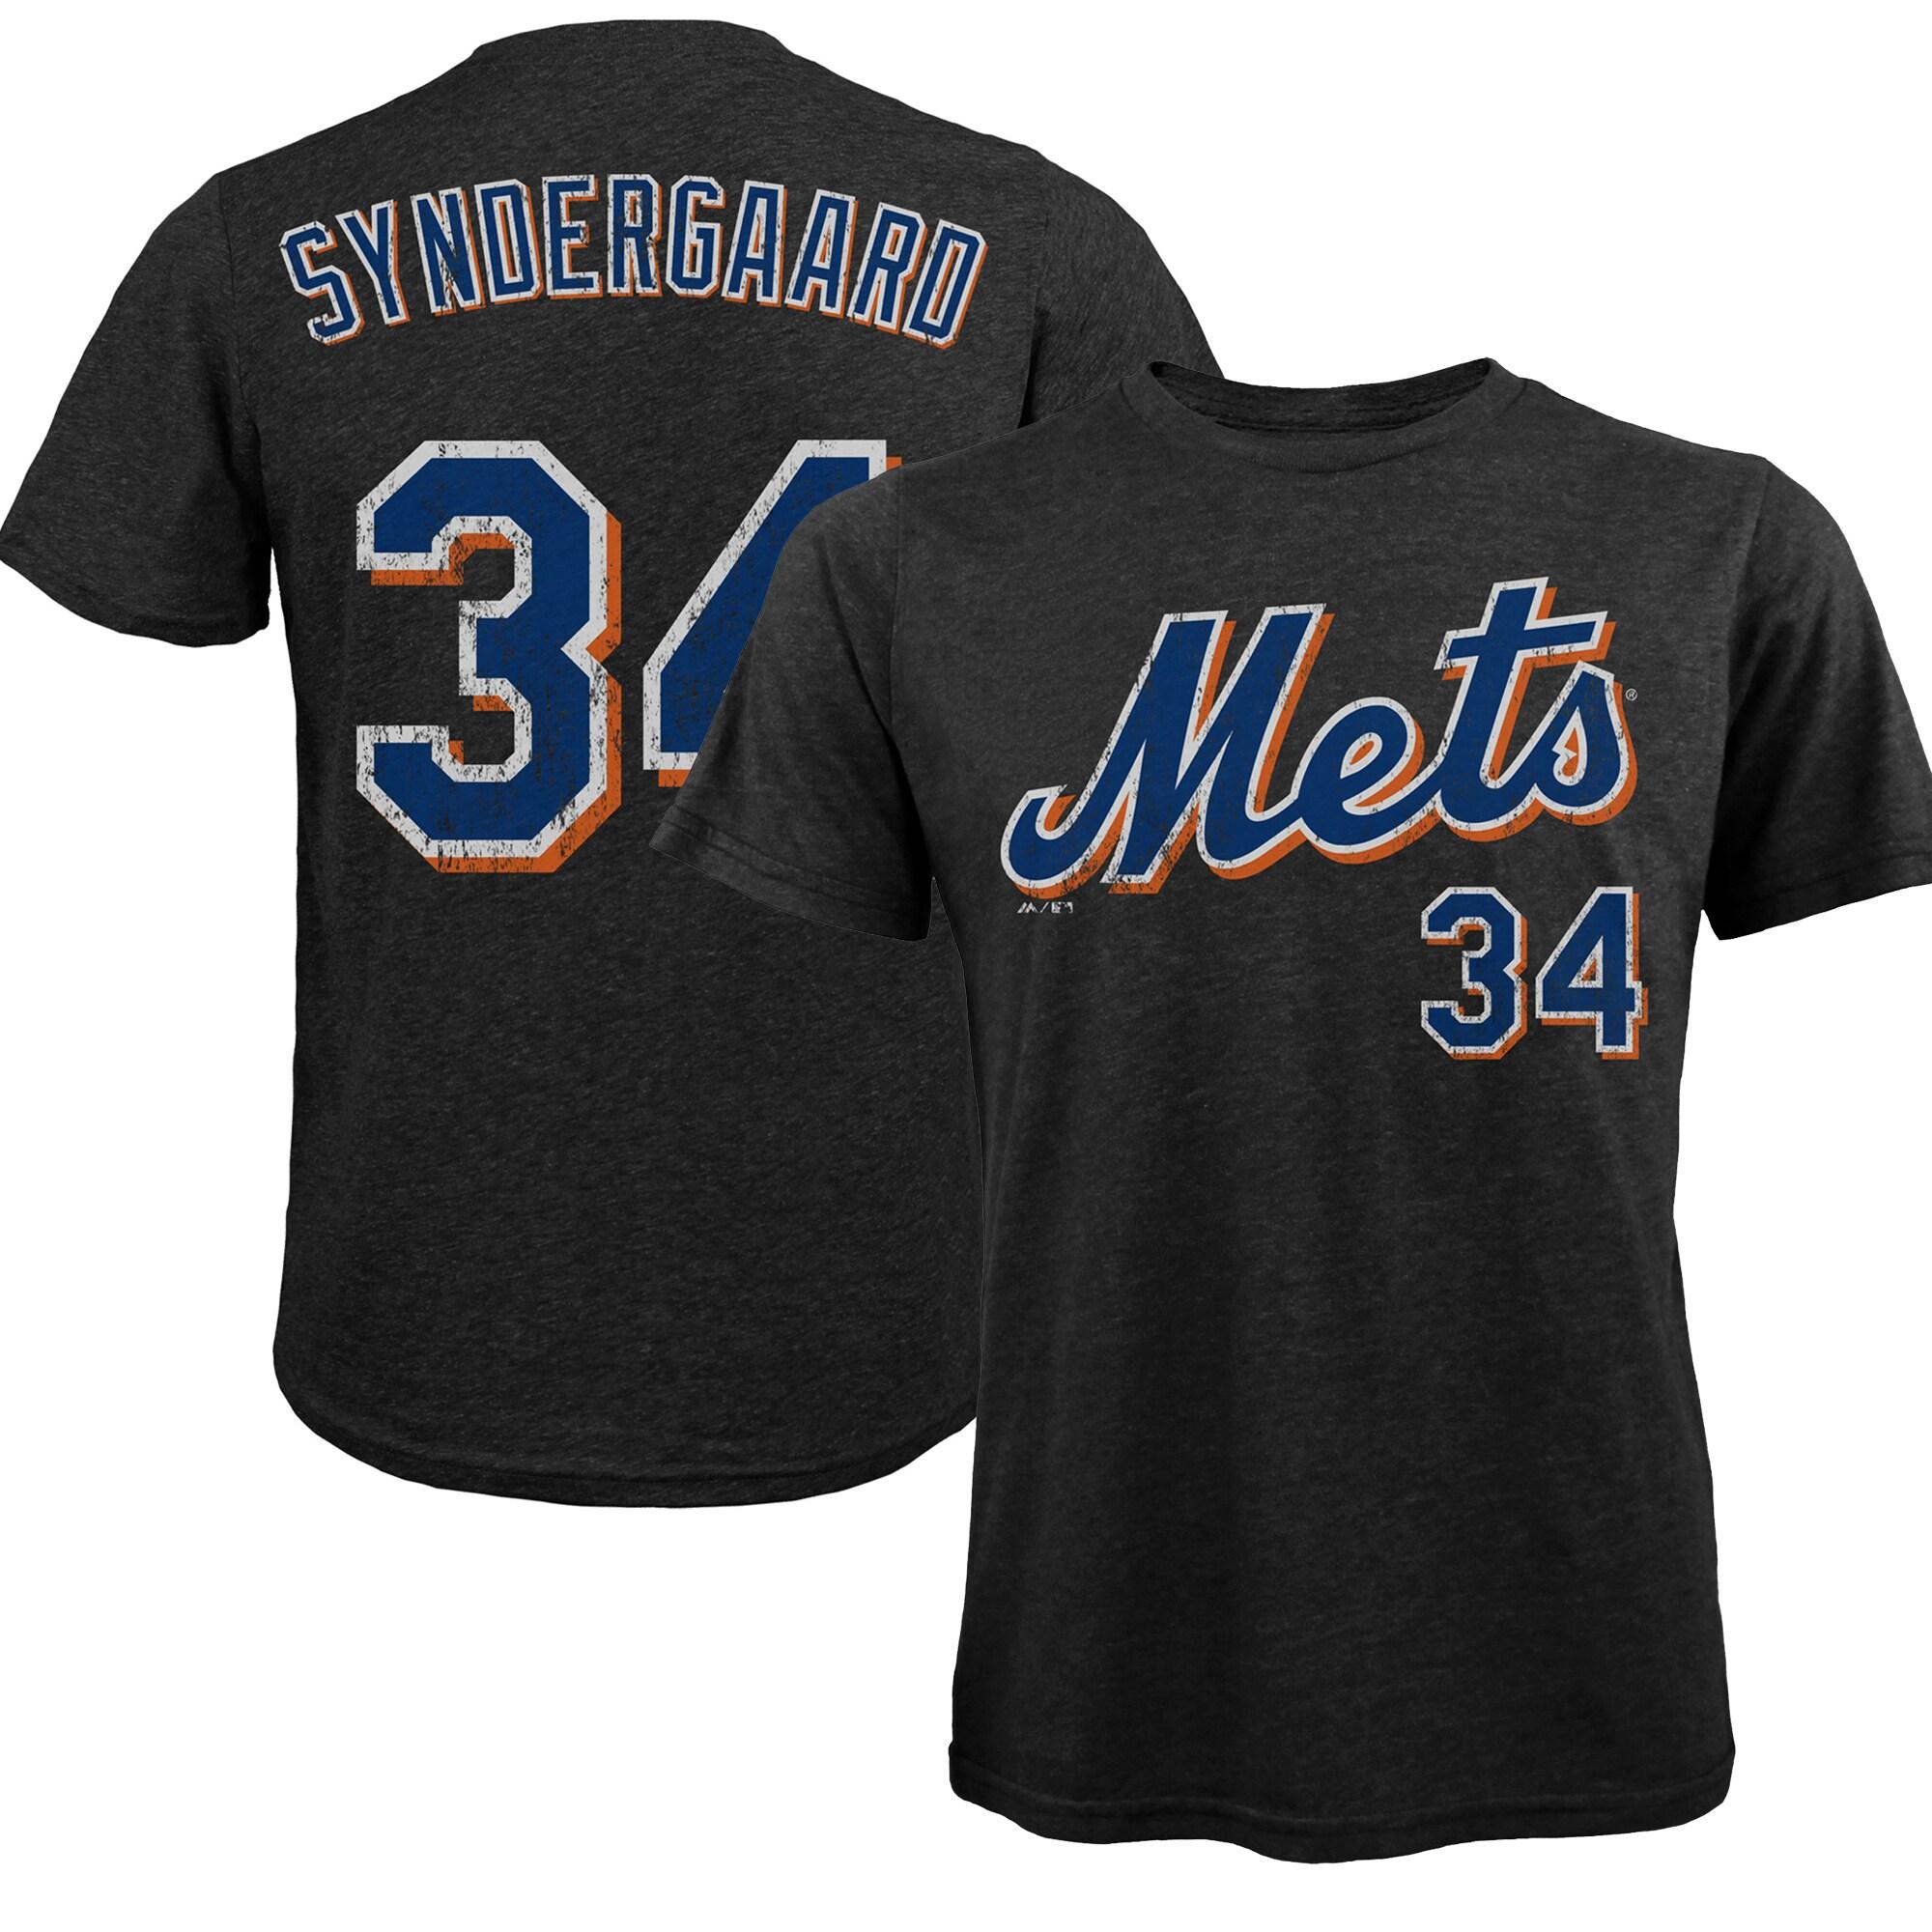 Noah Syndergaard New York Mets Majestic Threads Premium Tri-Blend Name & Number T-Shirt - Black